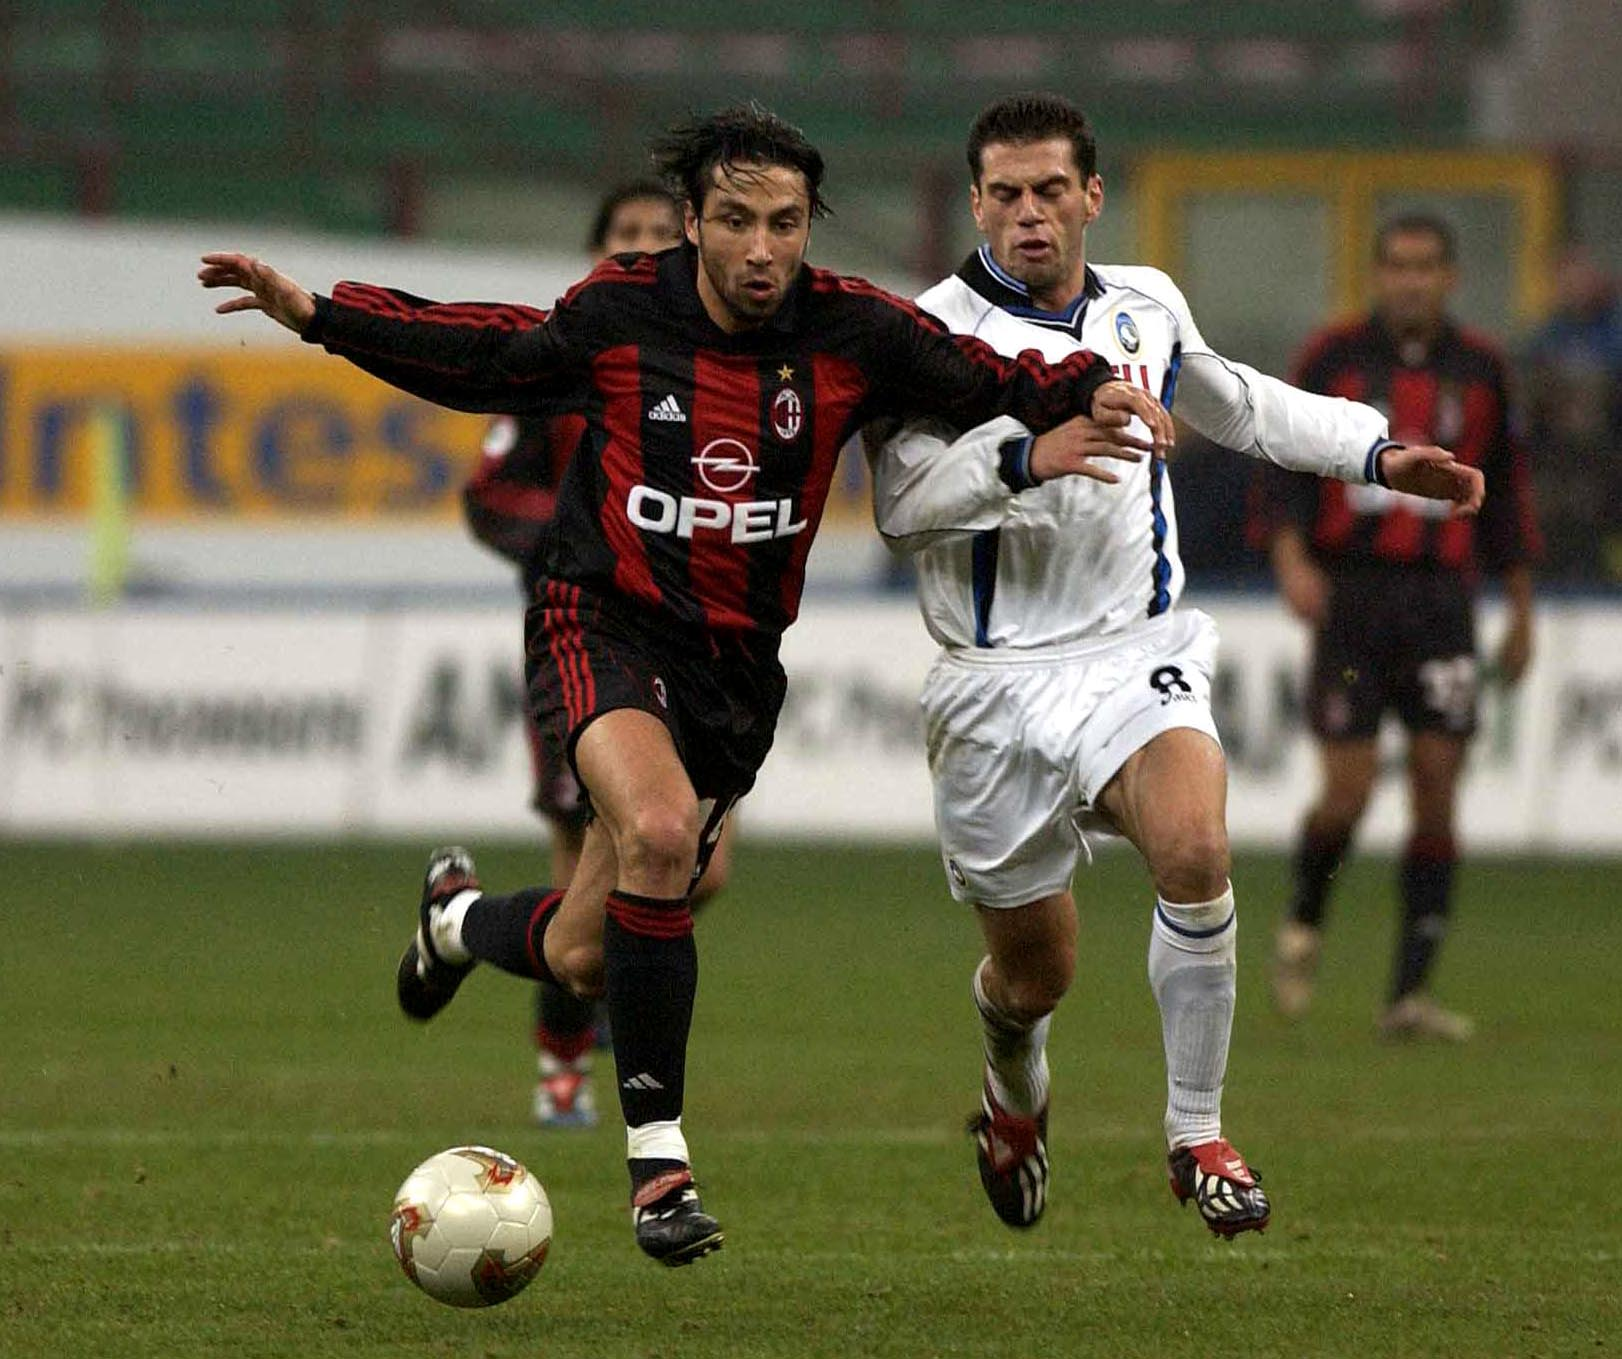 16 Feb 2002: Jose Mari of AC Milan and Luciano Zauri of Atalanta during the Serie A match between AC Milan and Atalanta, played at the San Siro Stadium, Milan. DIGITAL IMAGE Mandatory Credit: Grazia Neri/Getty Images